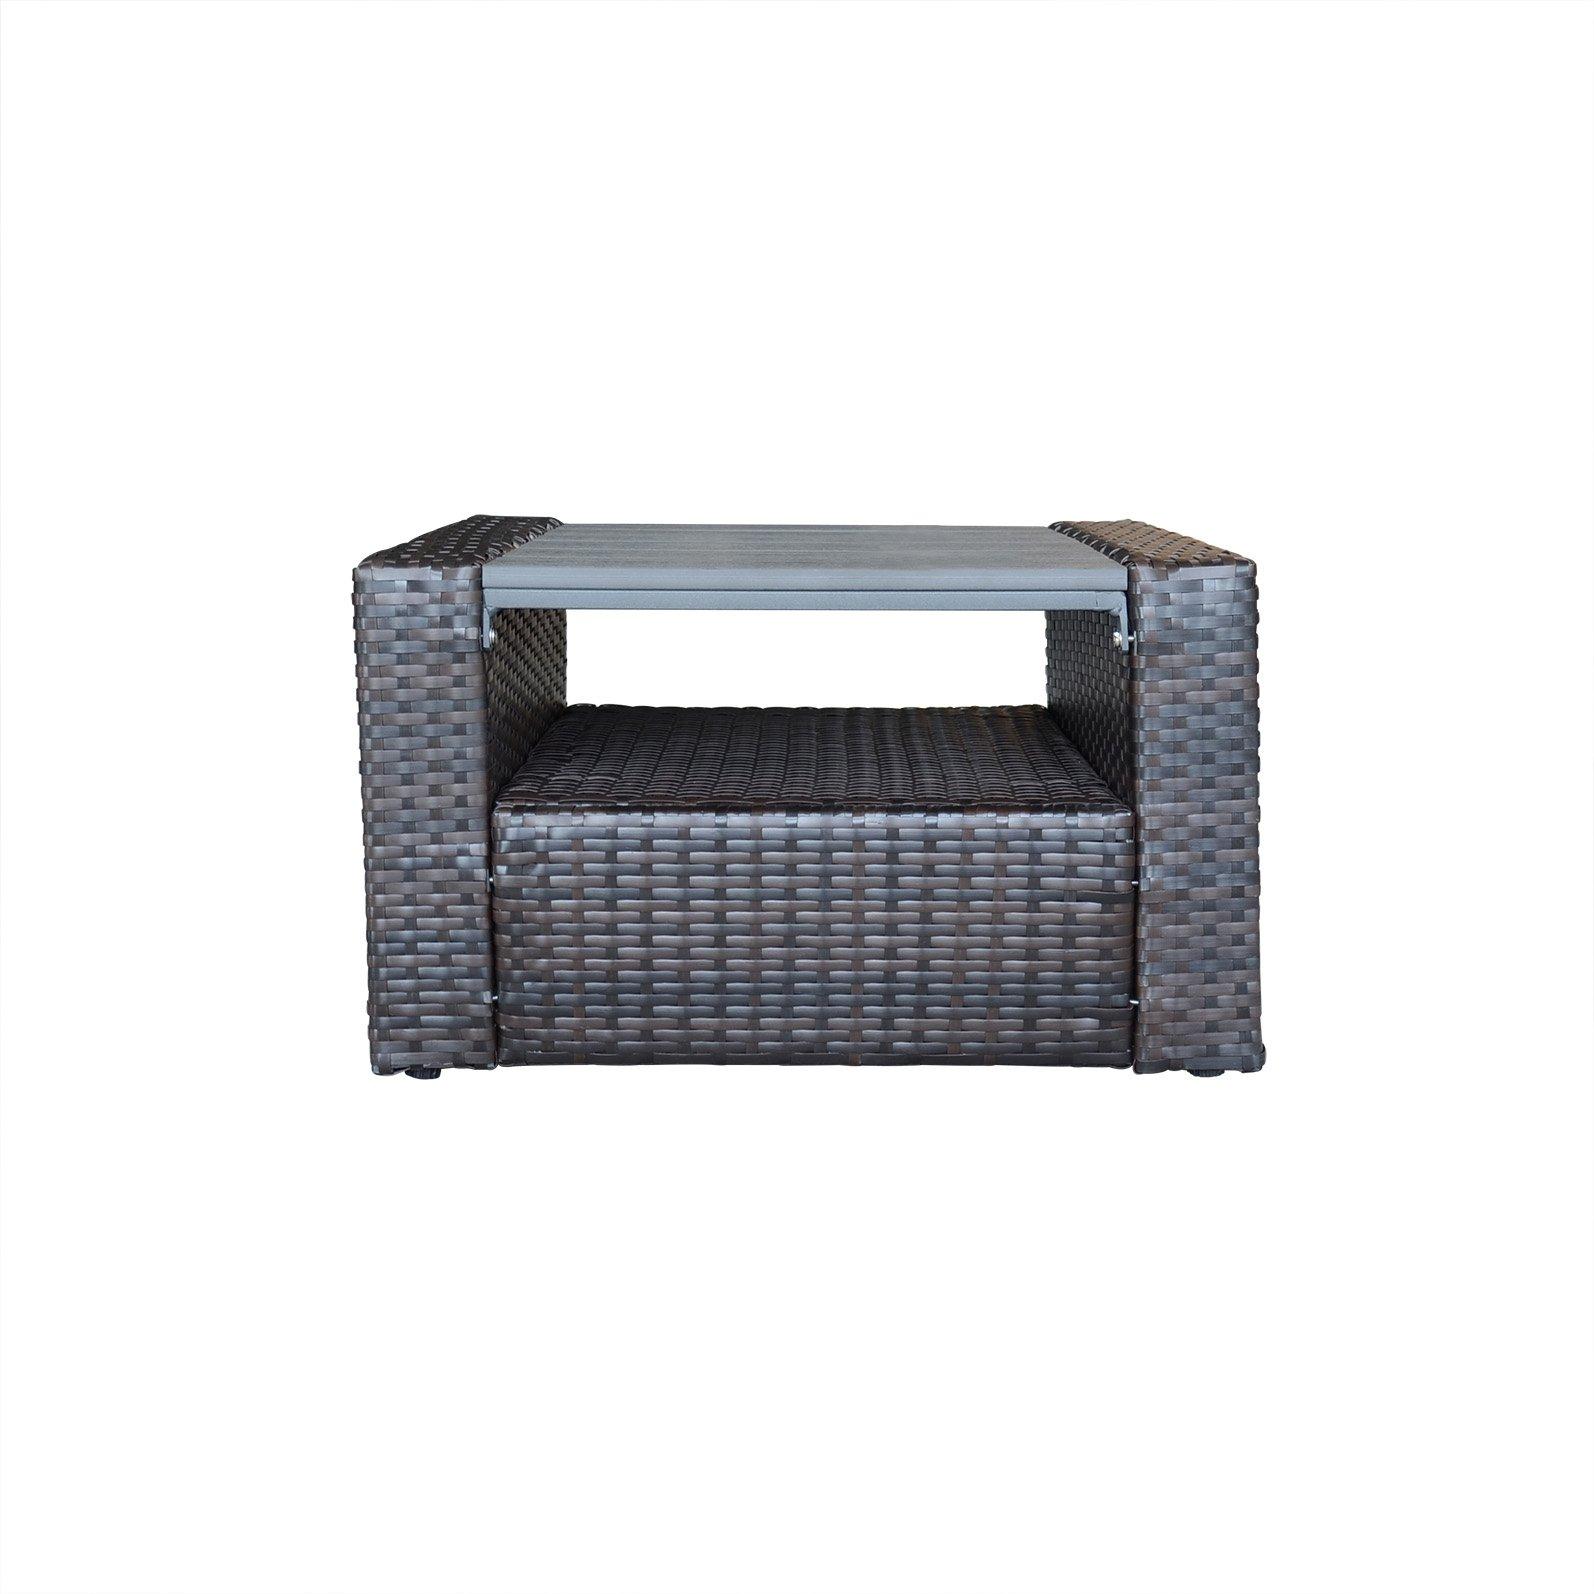 ORNO TTOBE Patio Furniture Square Wicker Coffee Table with Storage Function,Small